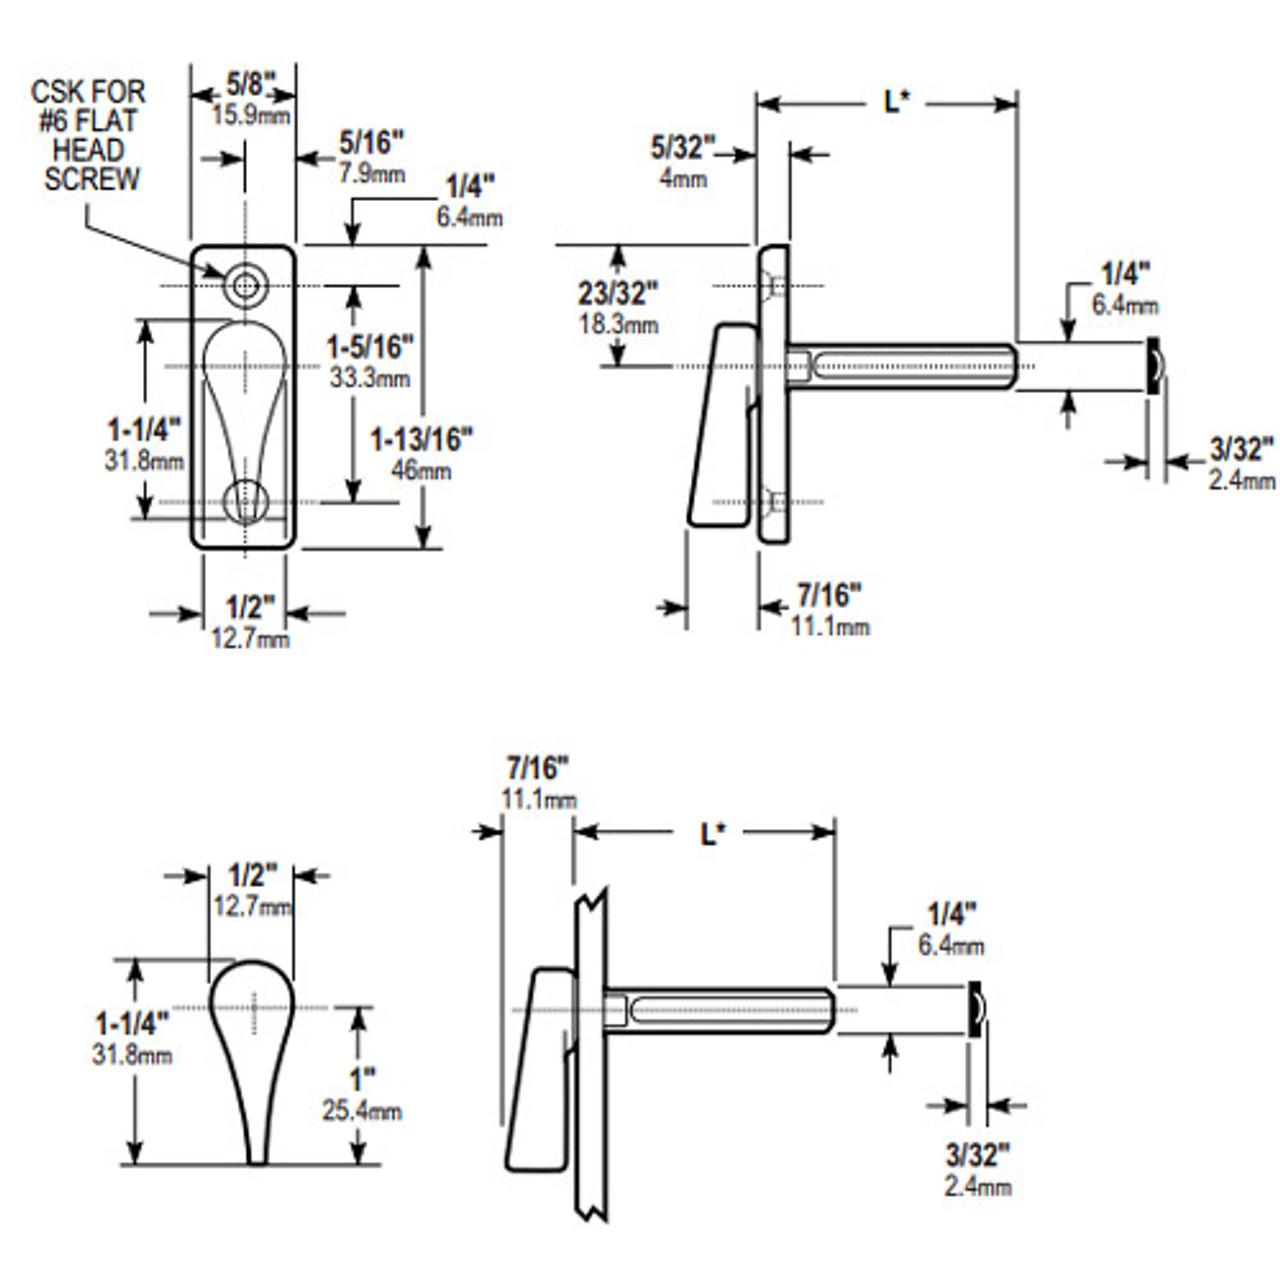 1000-02-14-121 Adams Rite 1000 Series Turns Dimensional View